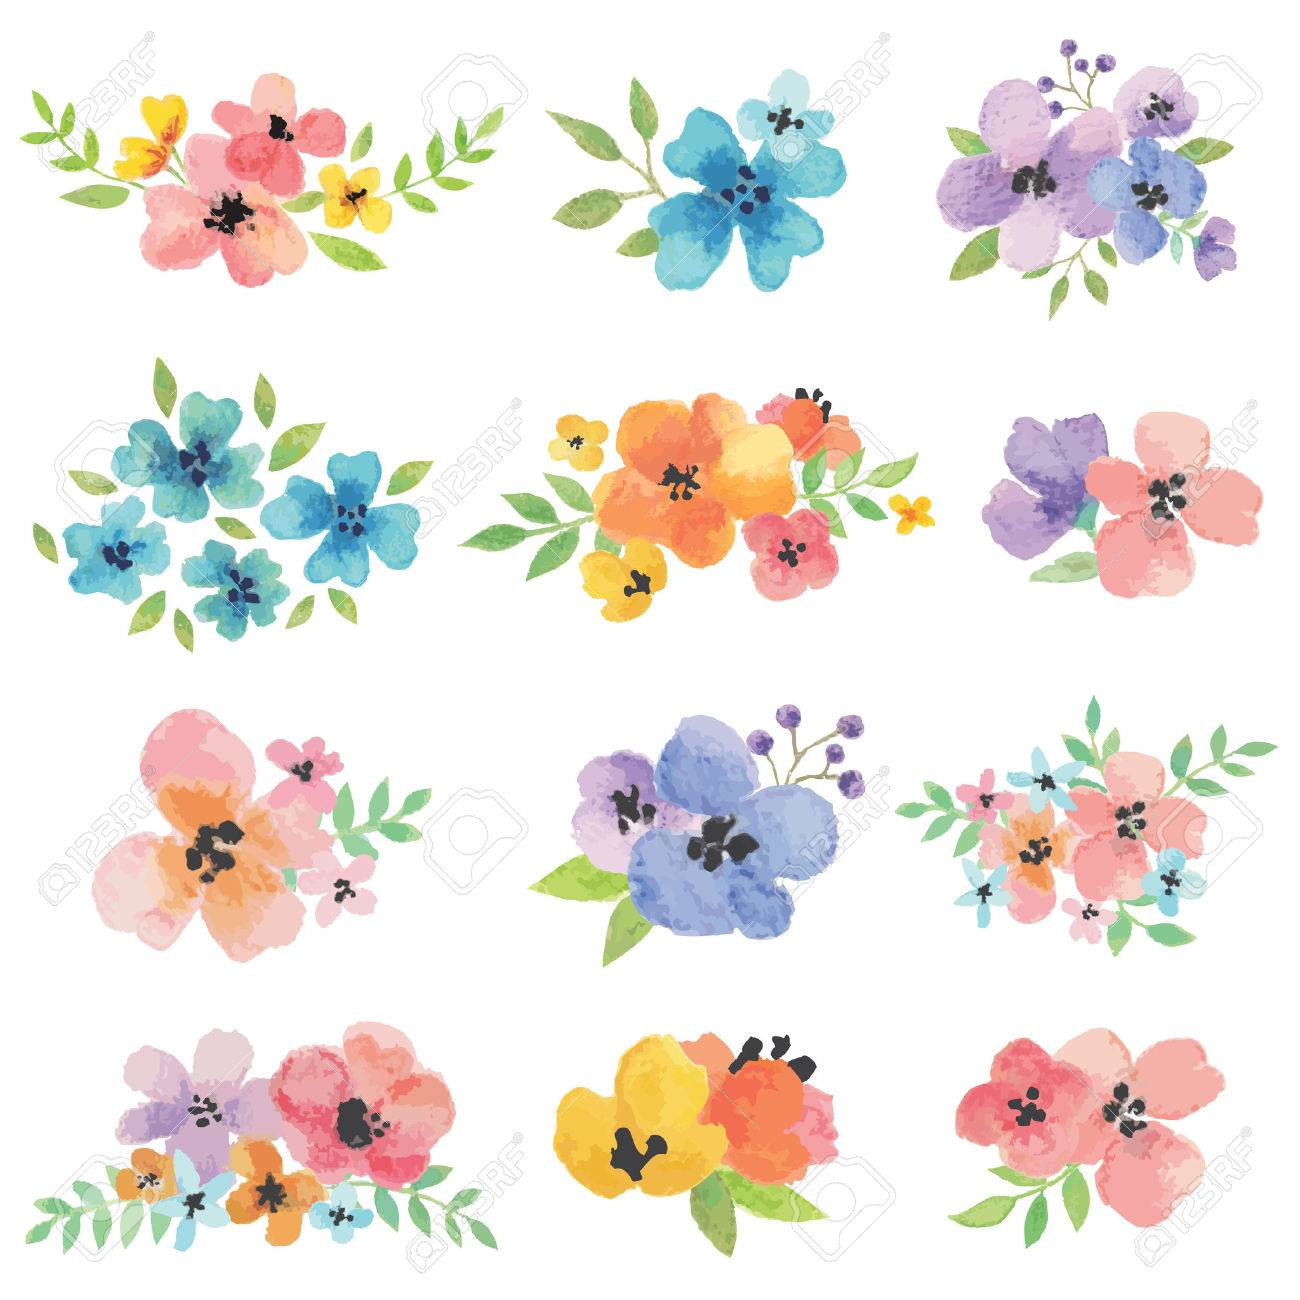 Watercolor Vector Flowers - 50098527